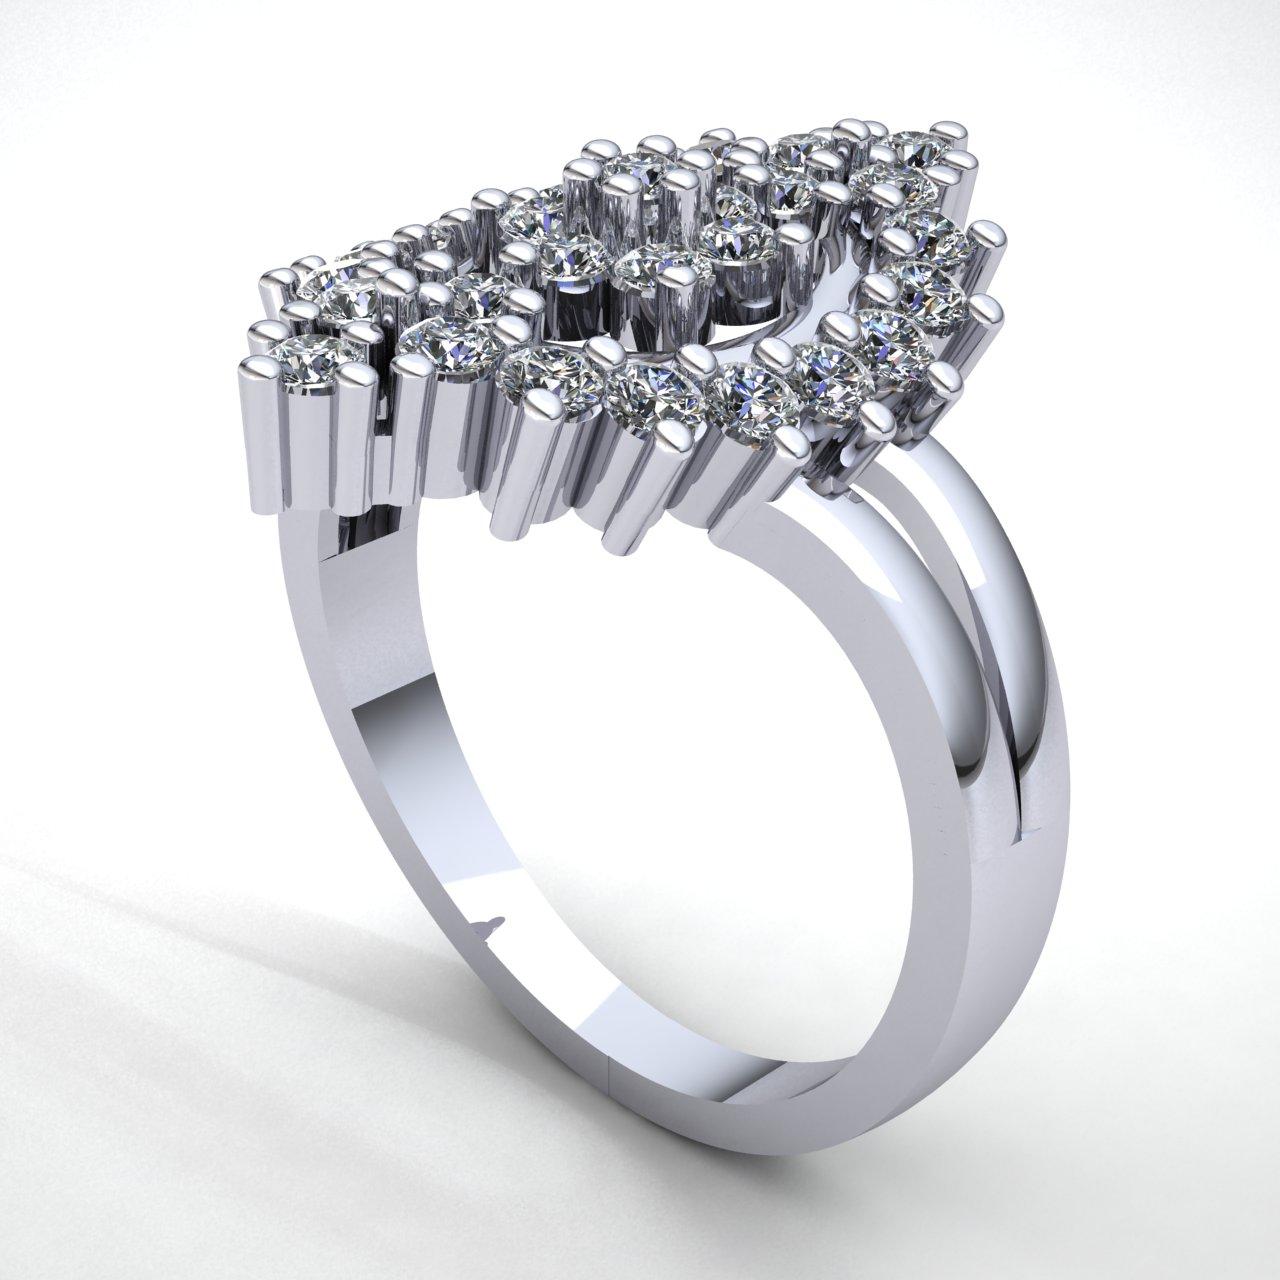 1-Quilate-Diamante-Brillante-Redondo-Mujer-Novia-Flor-Halo-Anillo-de-Compromiso miniatura 10